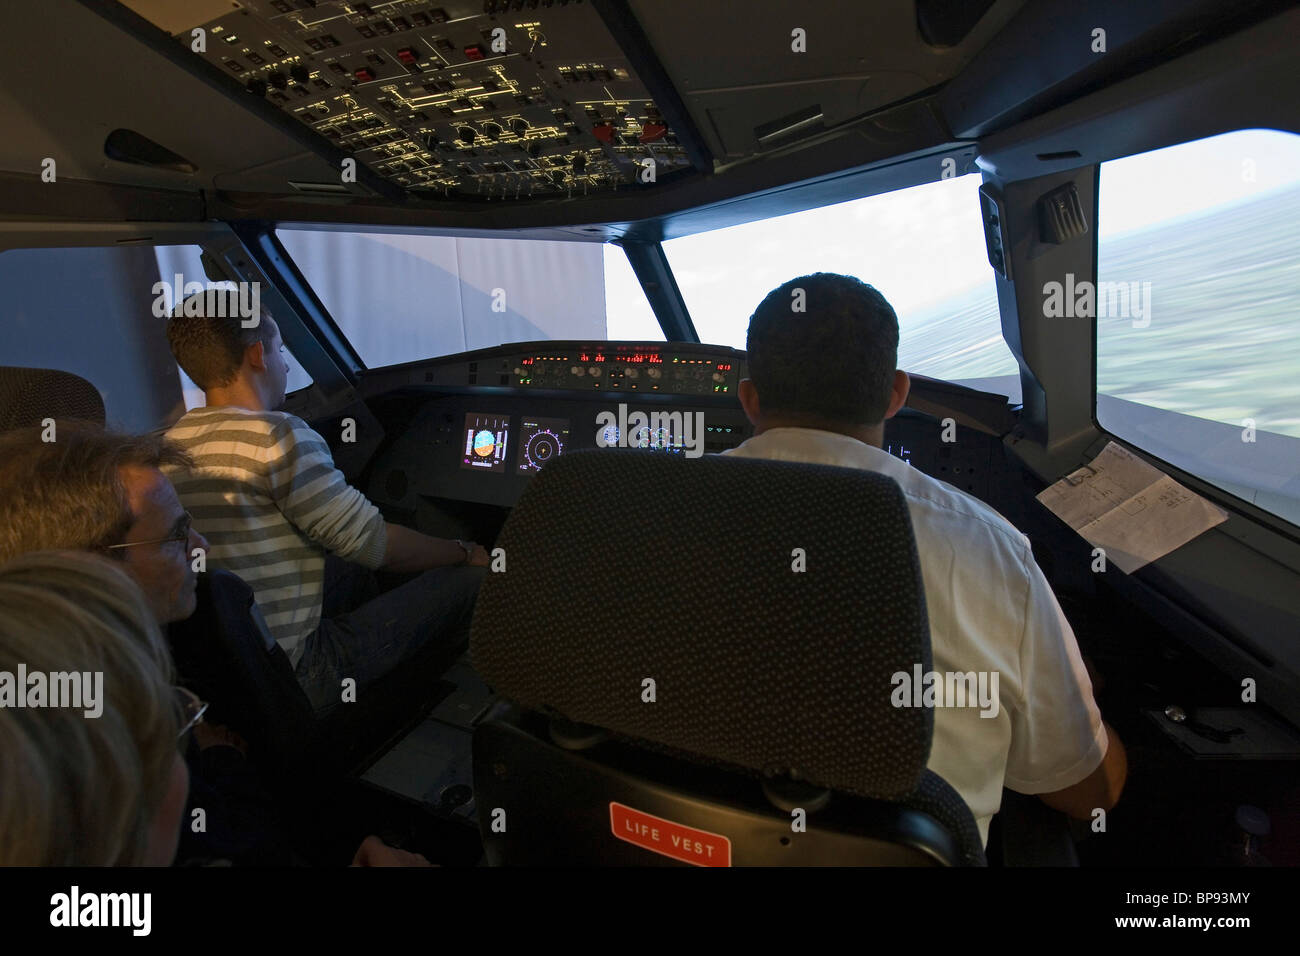 visitors in flight simulator, Welt der Luftfaht, World of Aviation, Hannover Airport, Lower Saxony, Germany - Stock Image